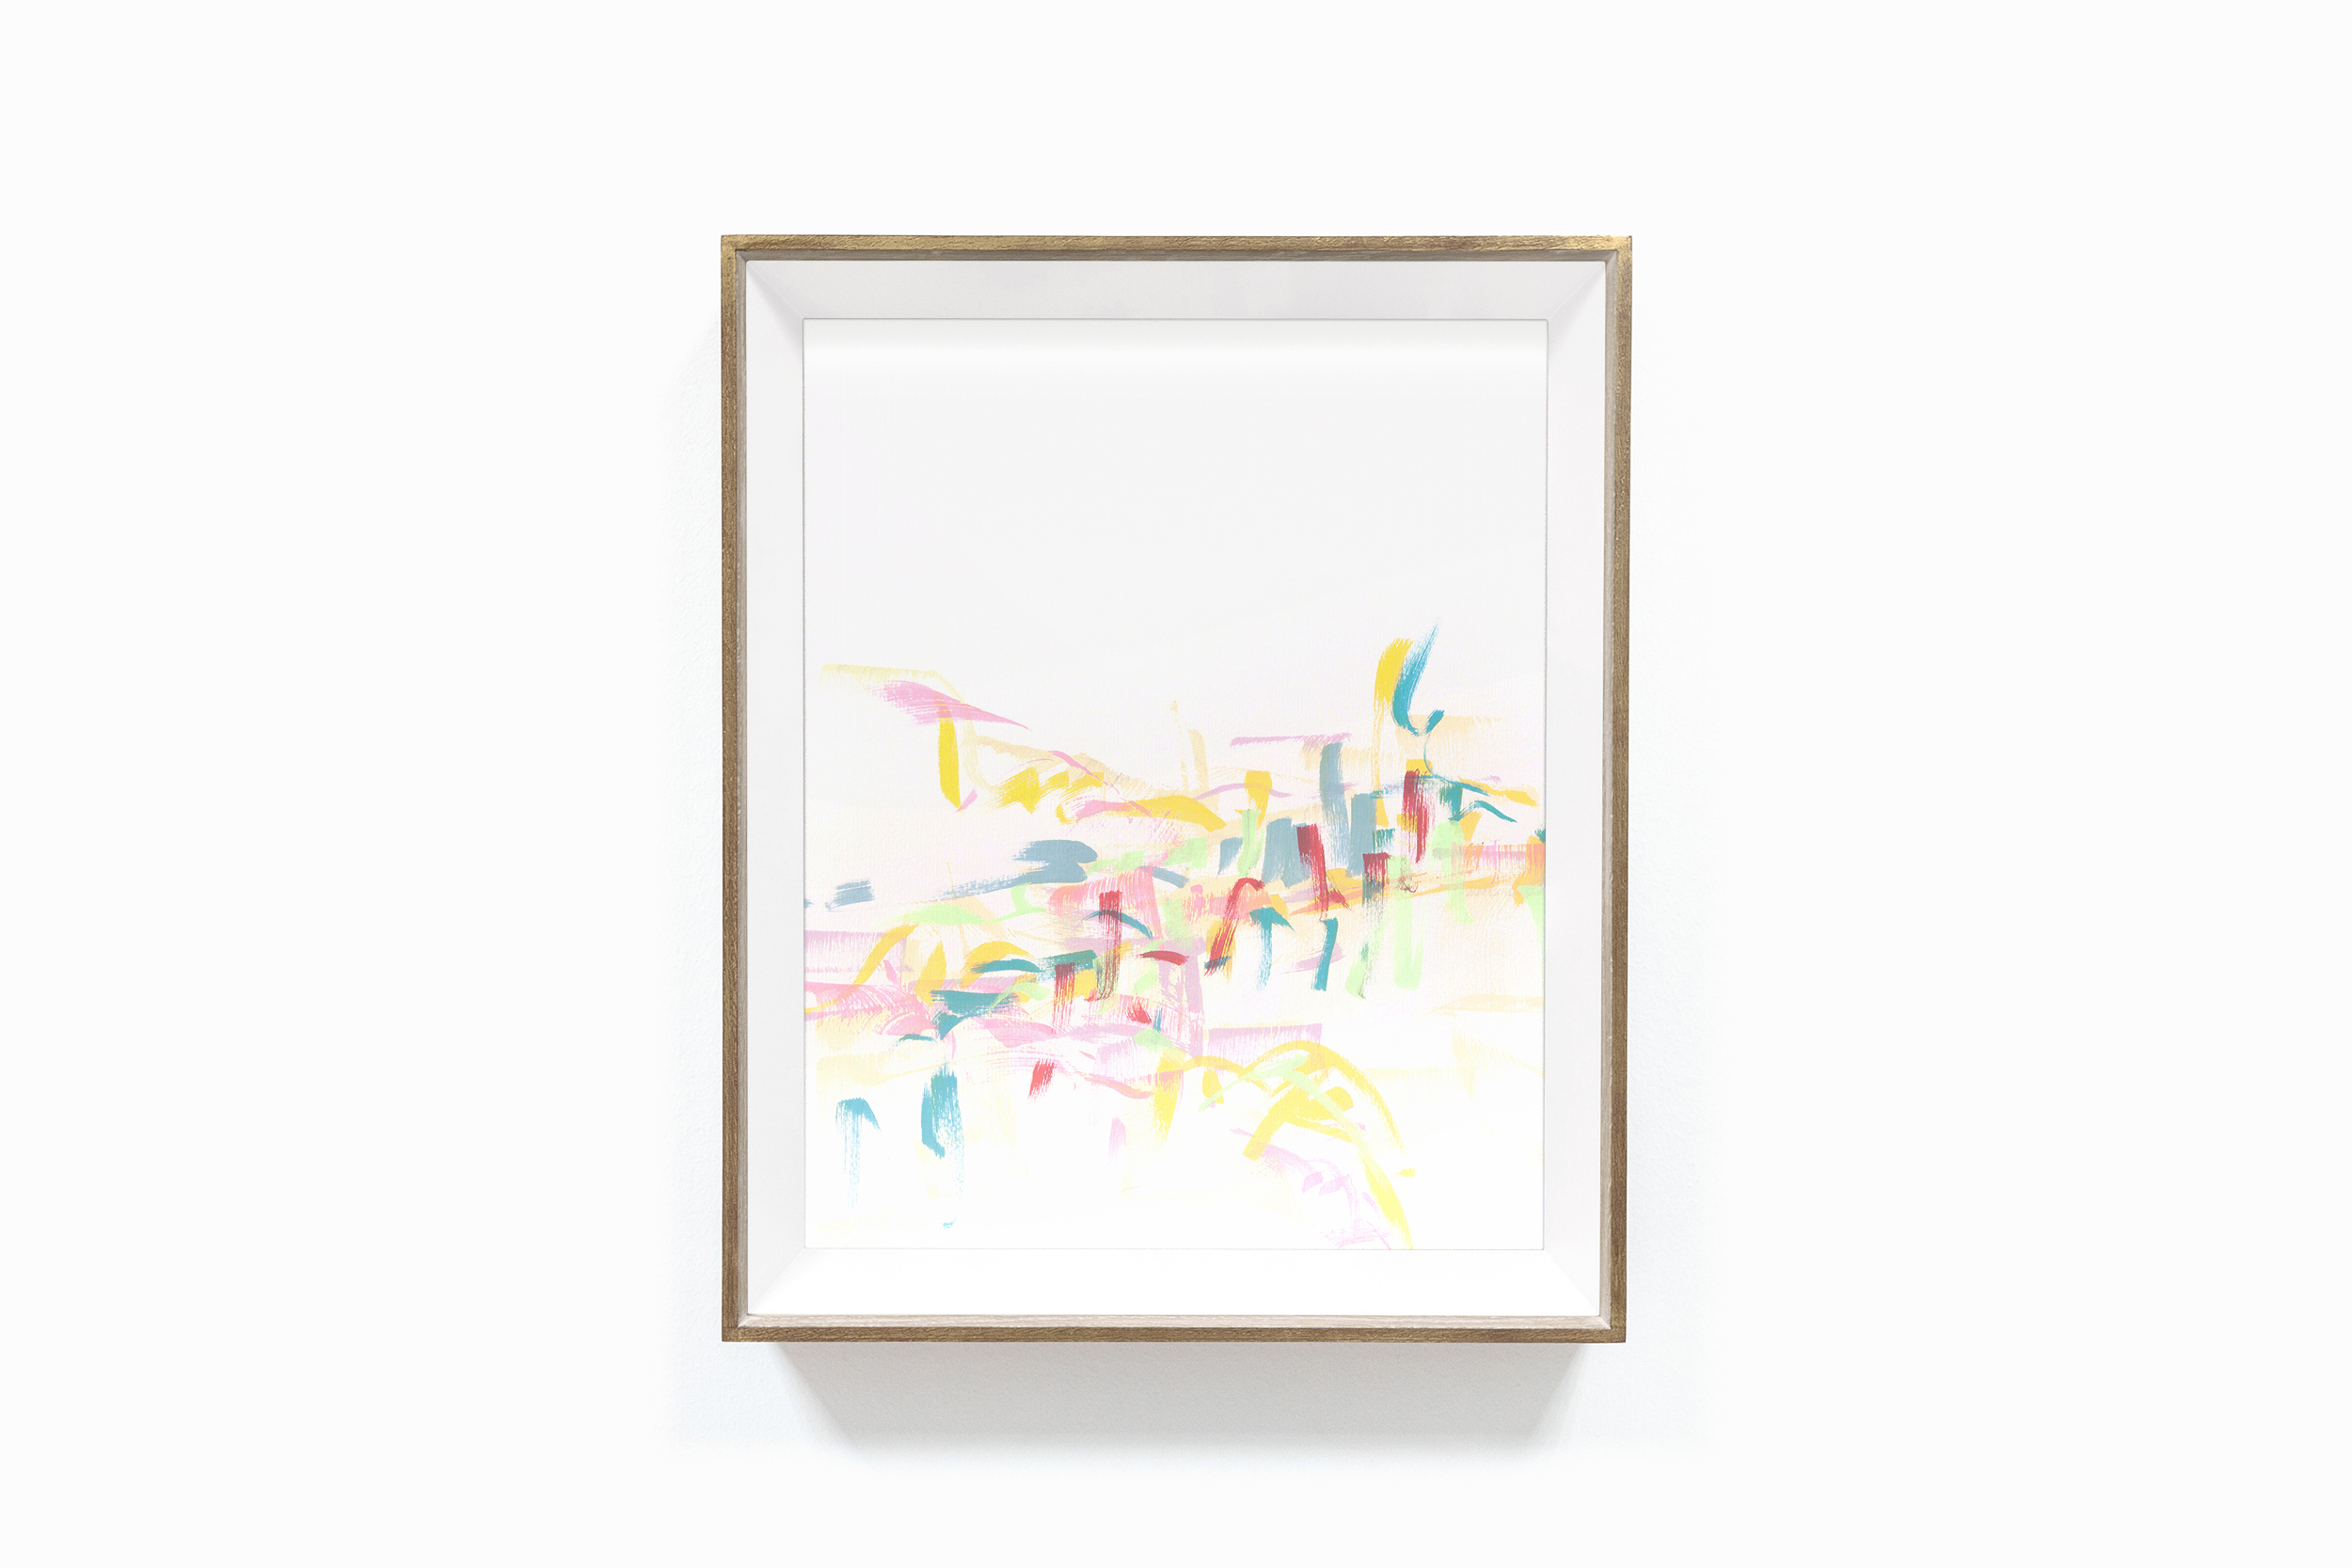 bonjourmolotov+Desniveis+Illustration+Ilustracao+painting+pintura+acrylic+acrílico+canvas+tela+paper+cardboard+mdf+Andre+Gigante+10N16.jpg